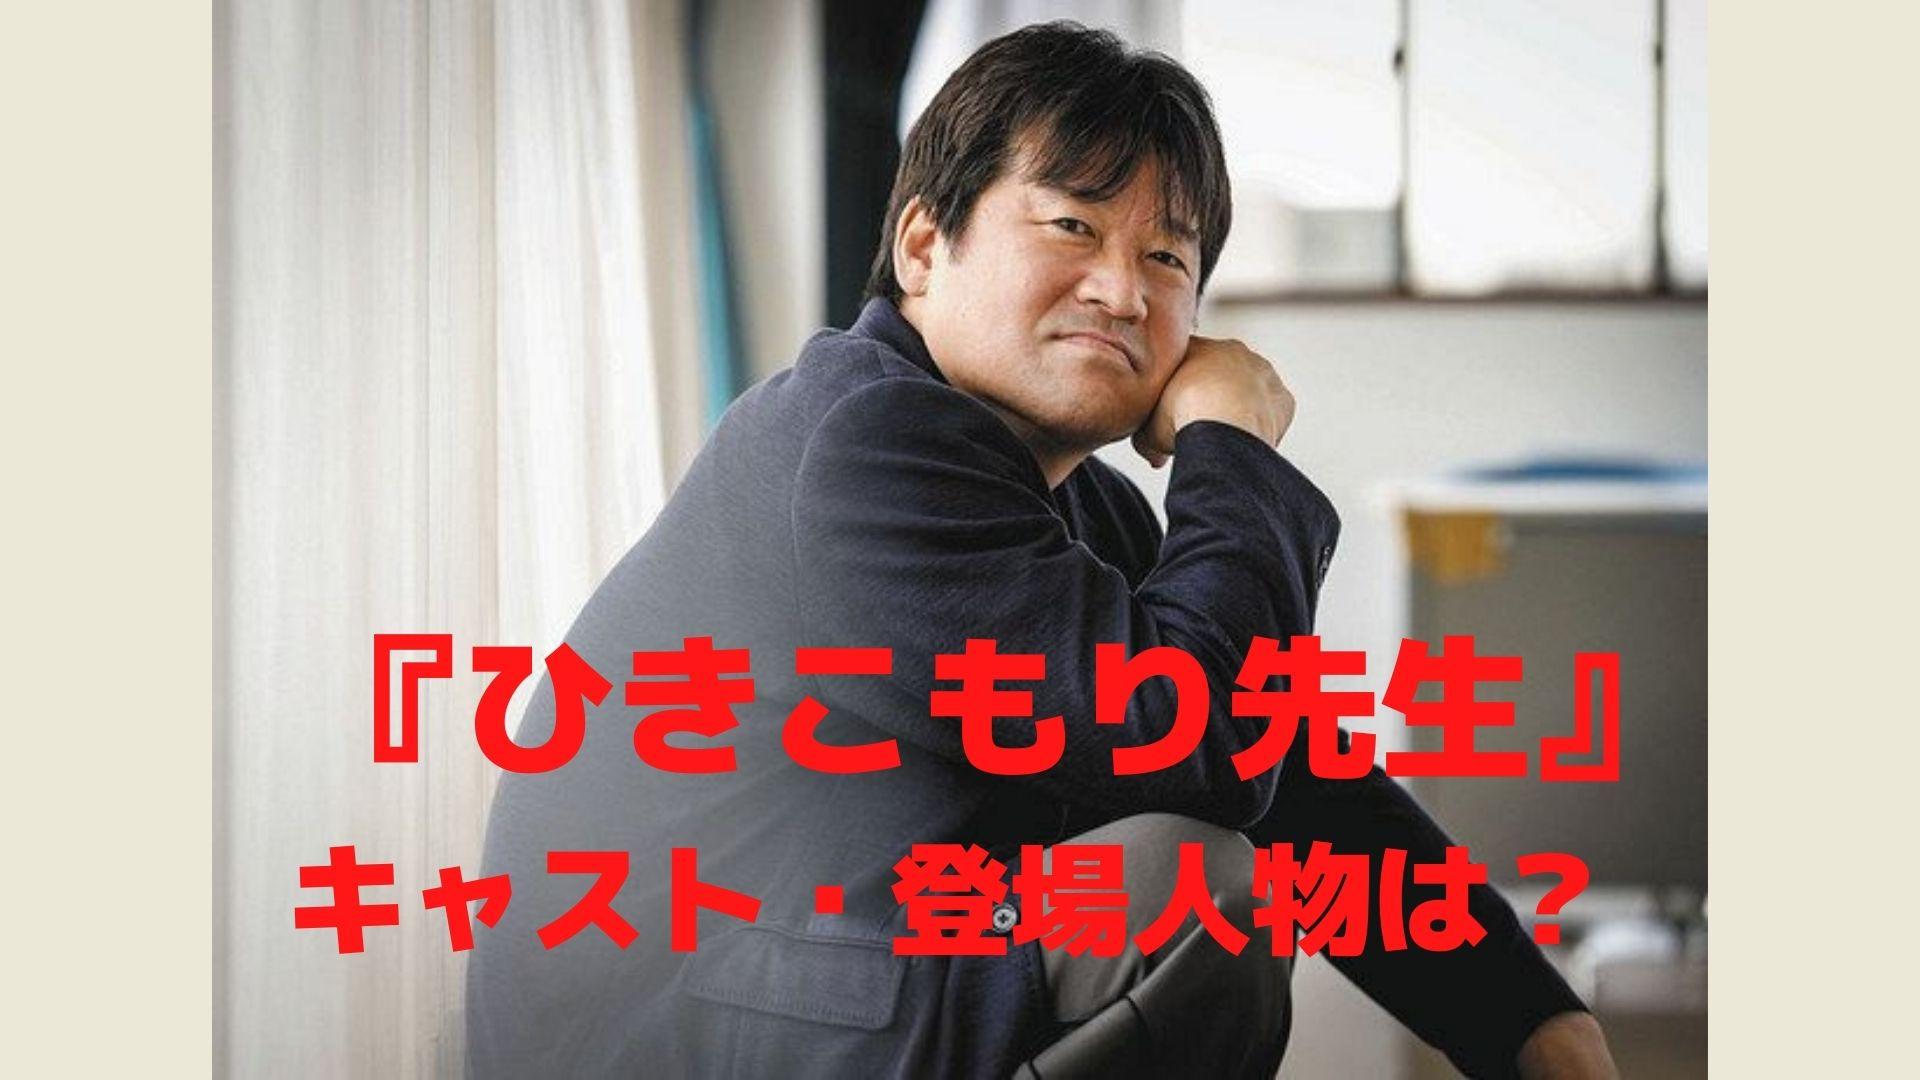 hikikomoriteacher-cast